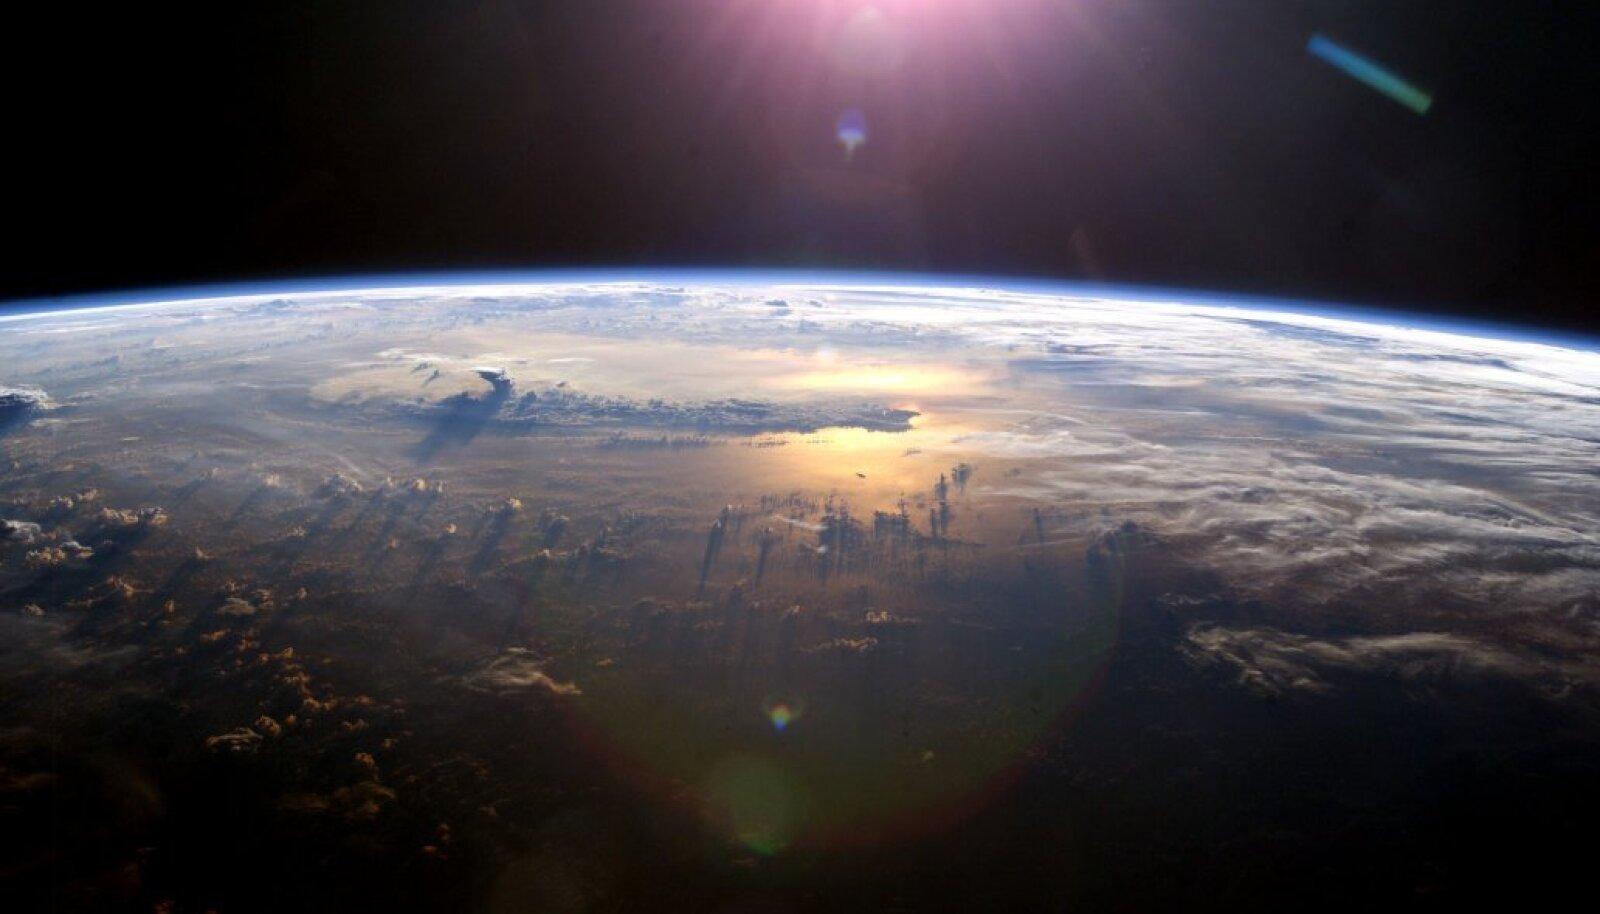 Foto: NASA Marshalli kosmoselennukeskus